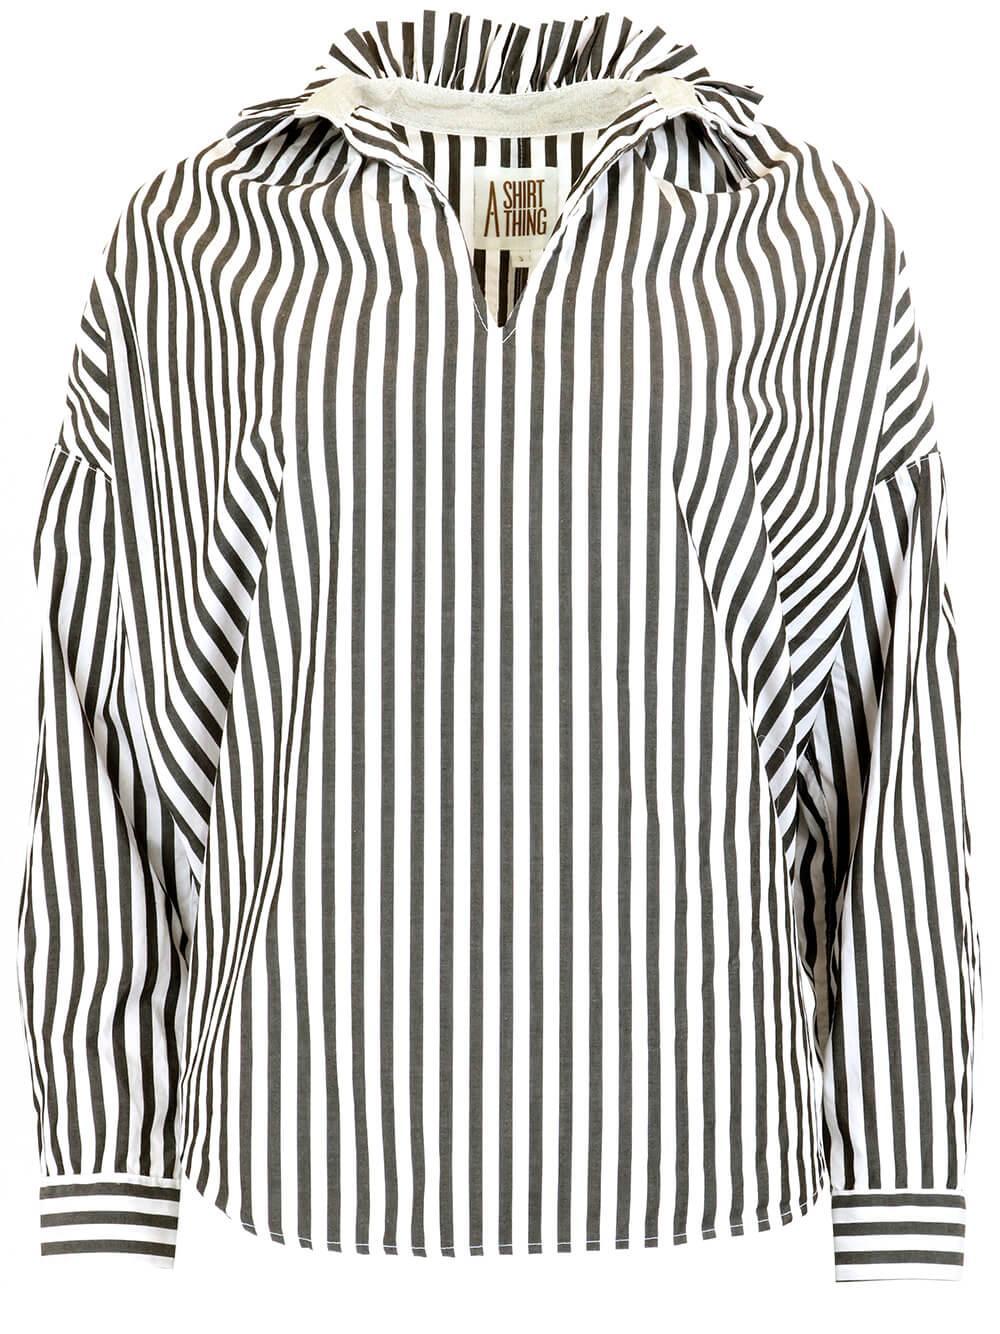 Penelope Cabo Striped Shirt